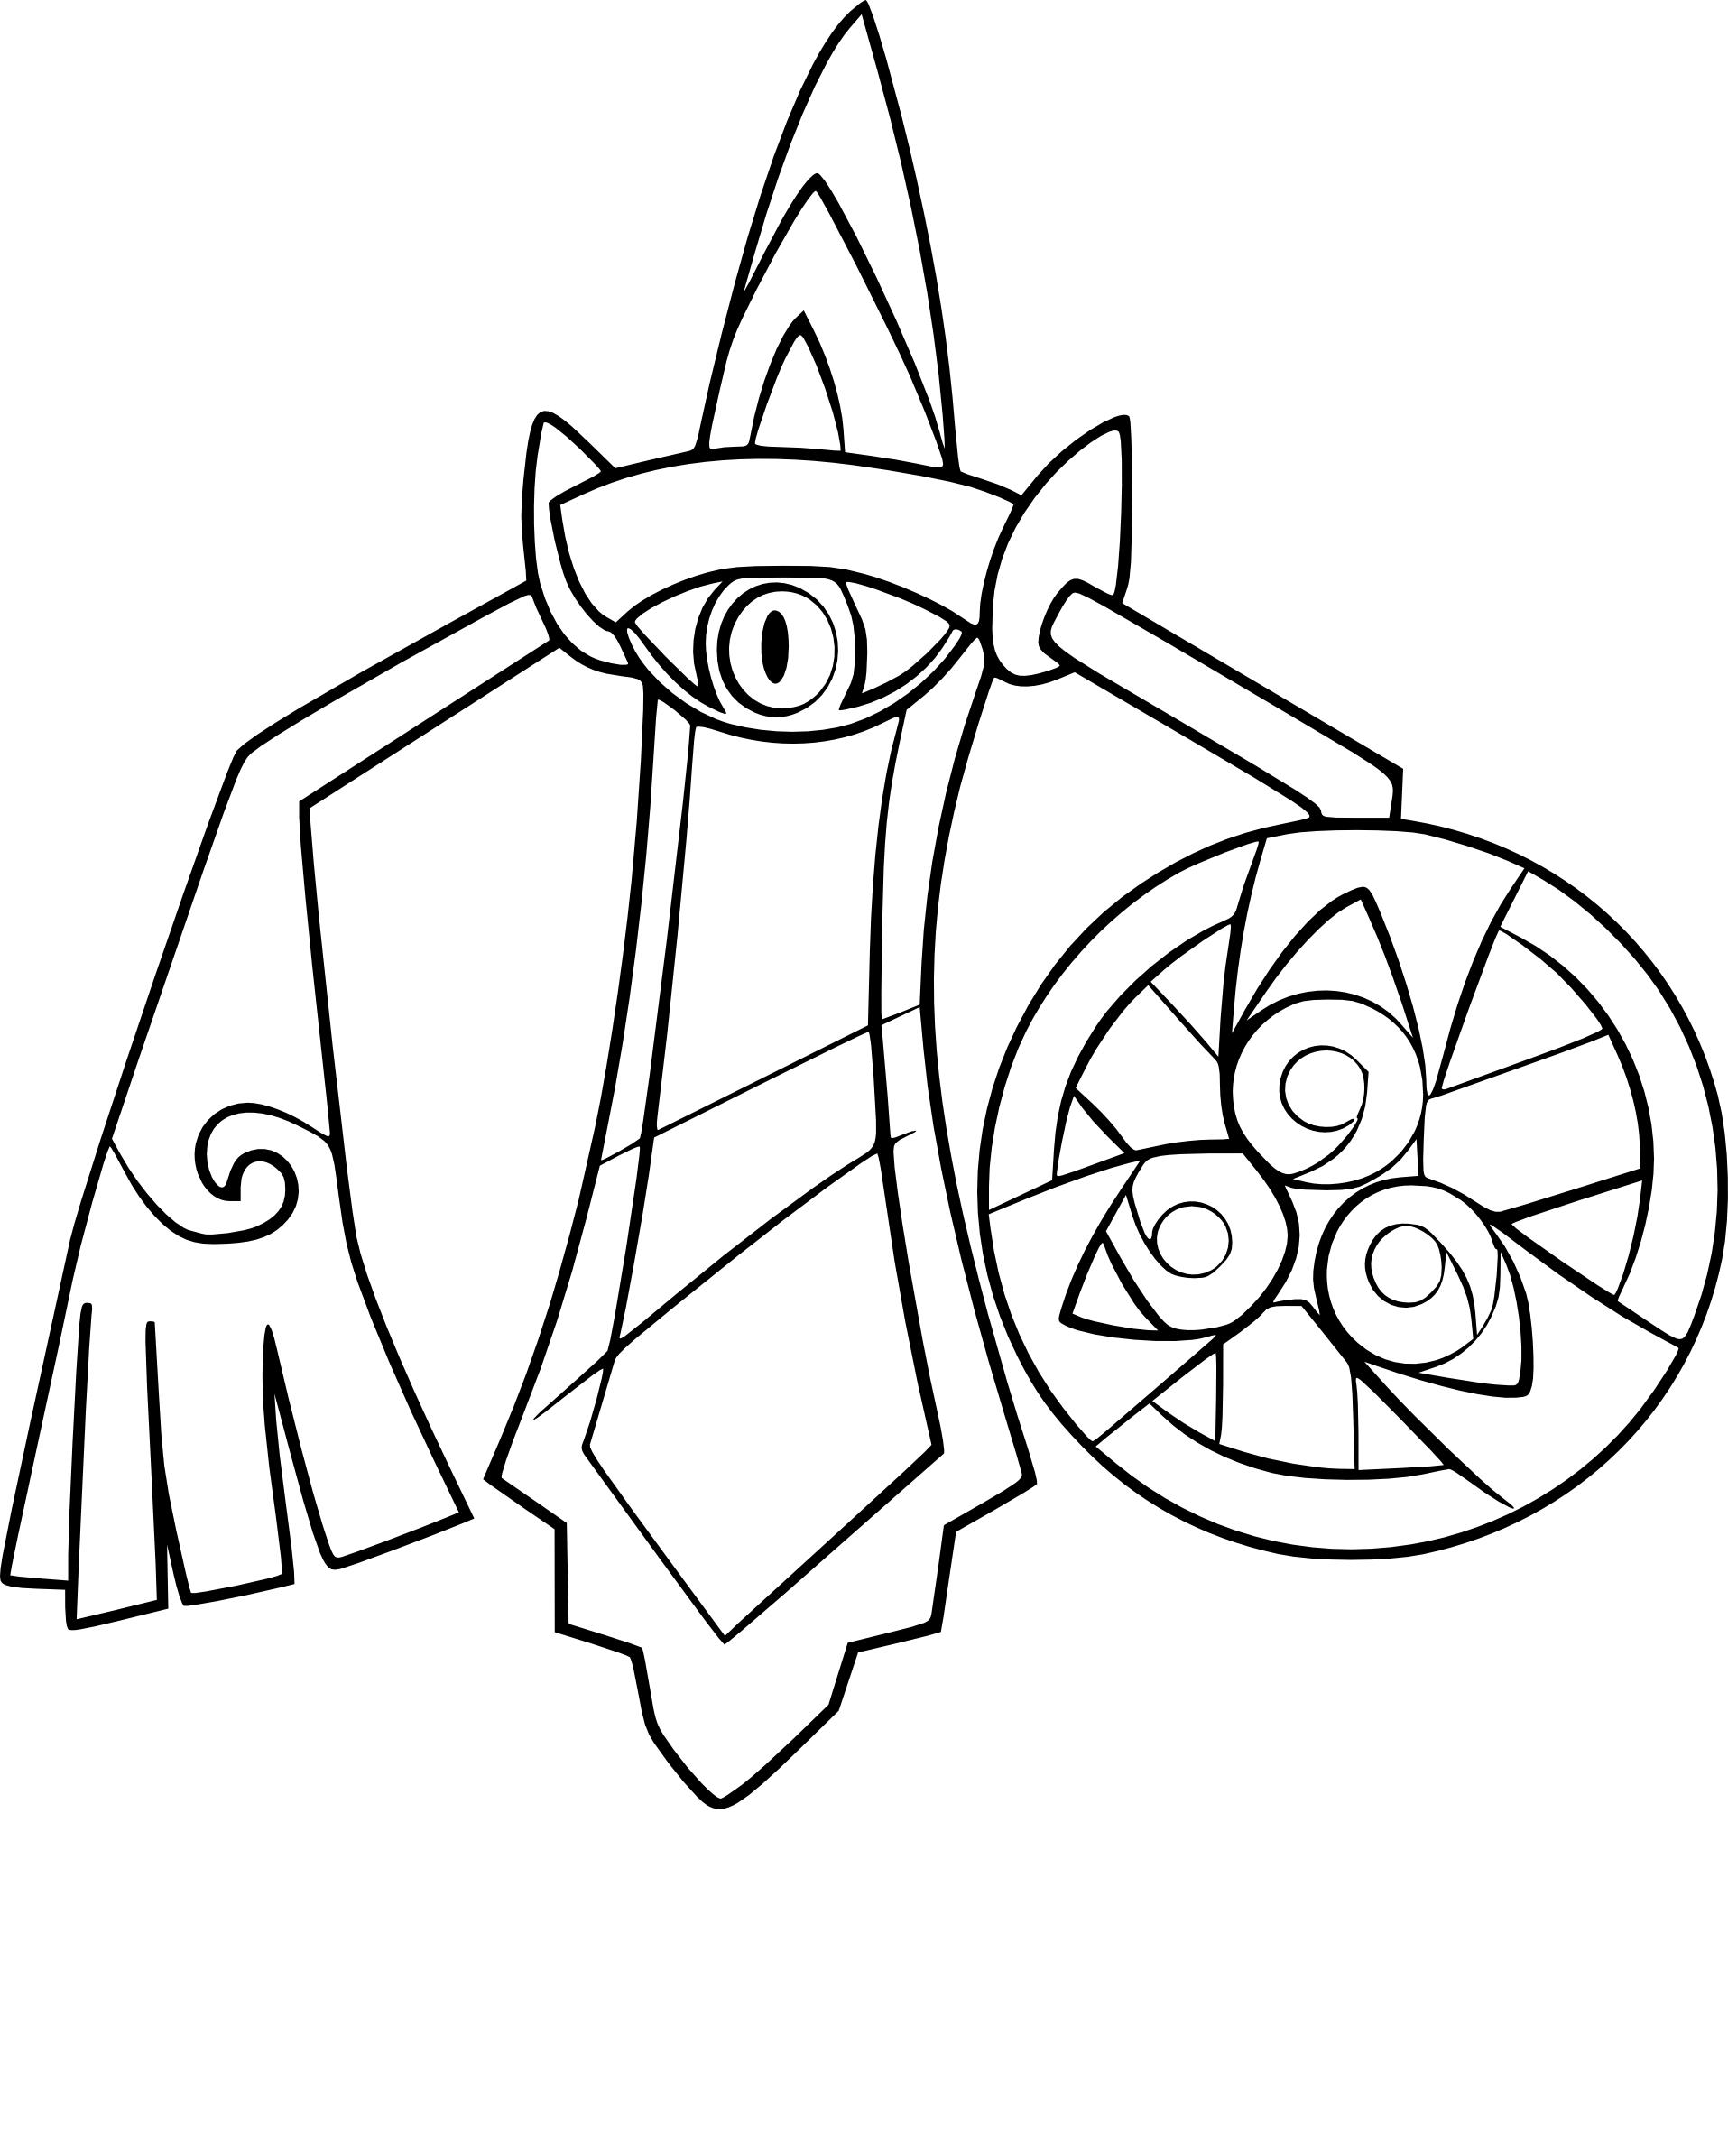 Coloriage Exagide Pokemon A Imprimer